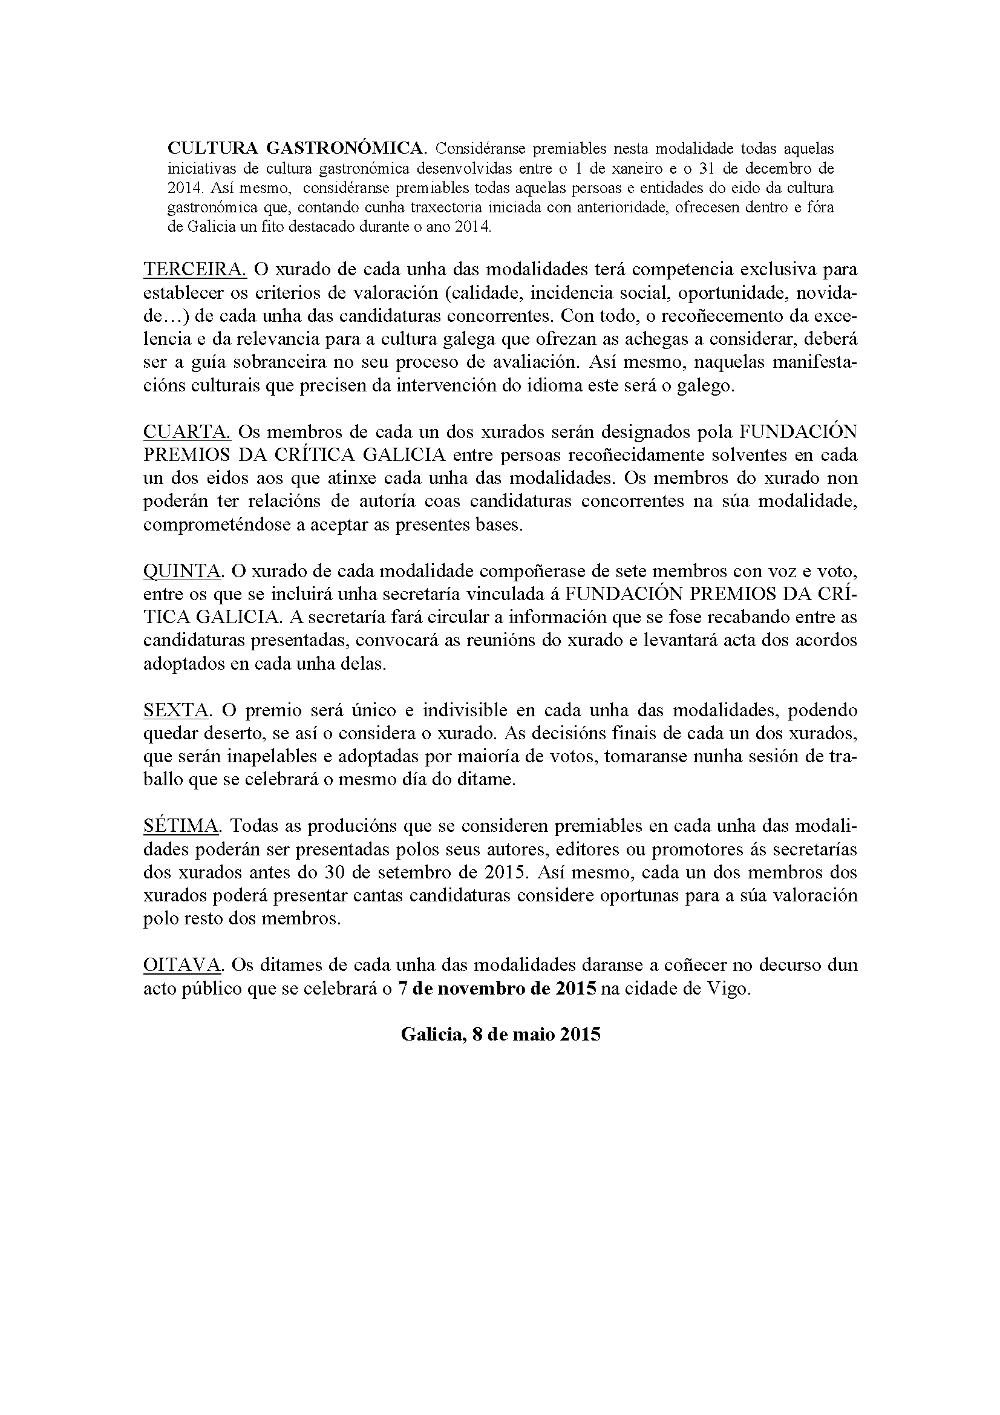 Bases Premios Crítica Galicia 2